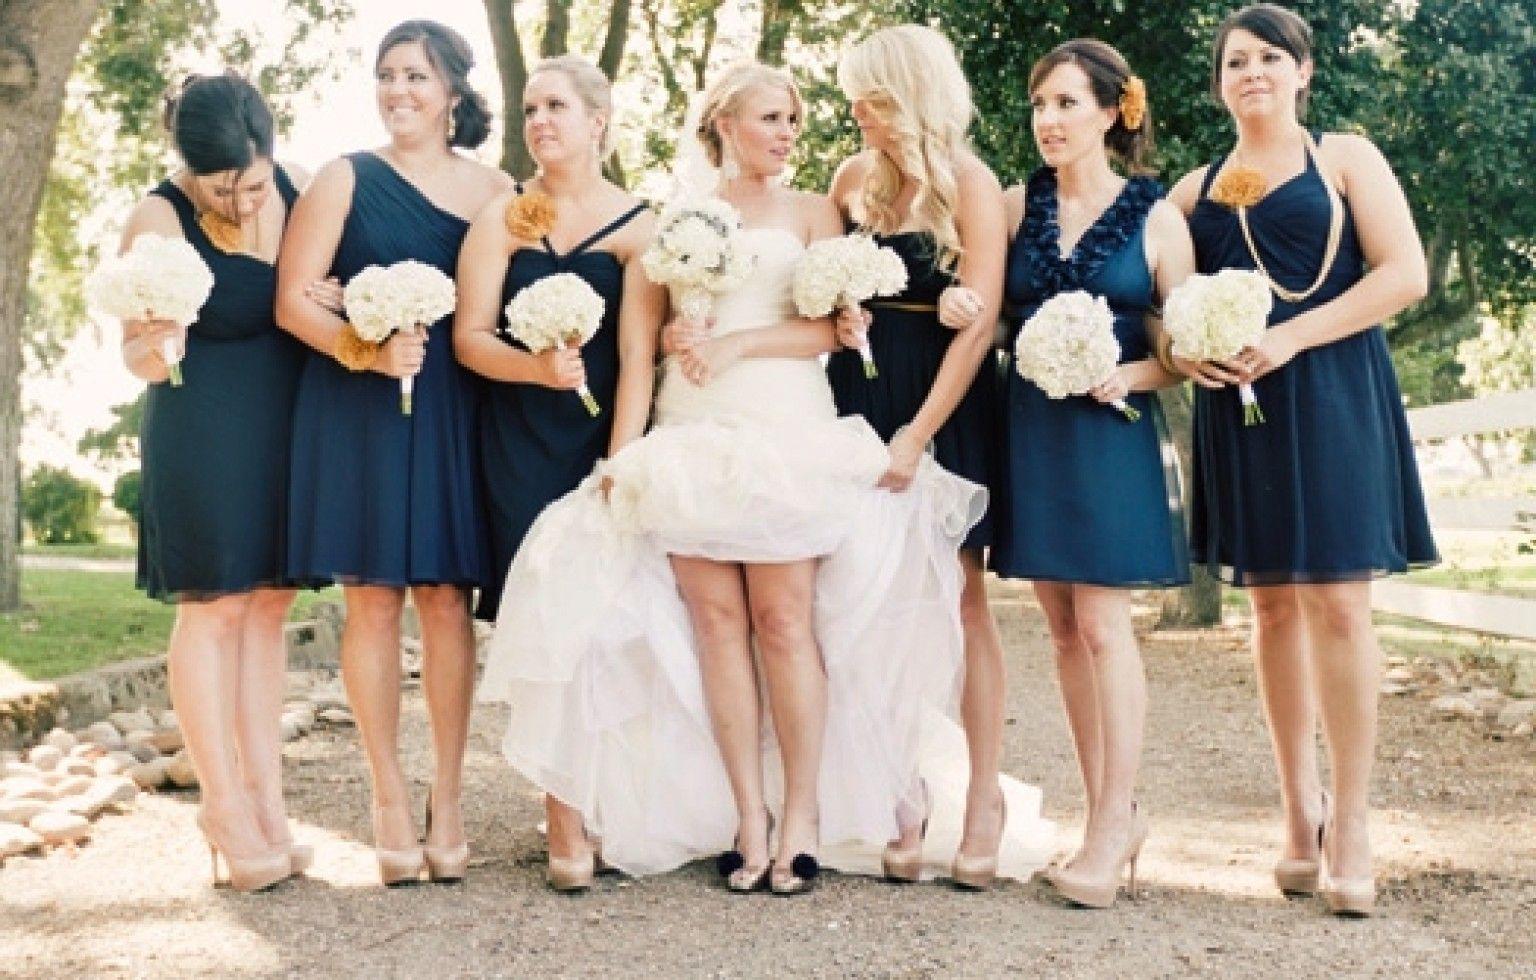 Photos the most versatile bridesmaid dress navy bridesmaids photos the most versatile bridesmaid dress ombrellifo Choice Image